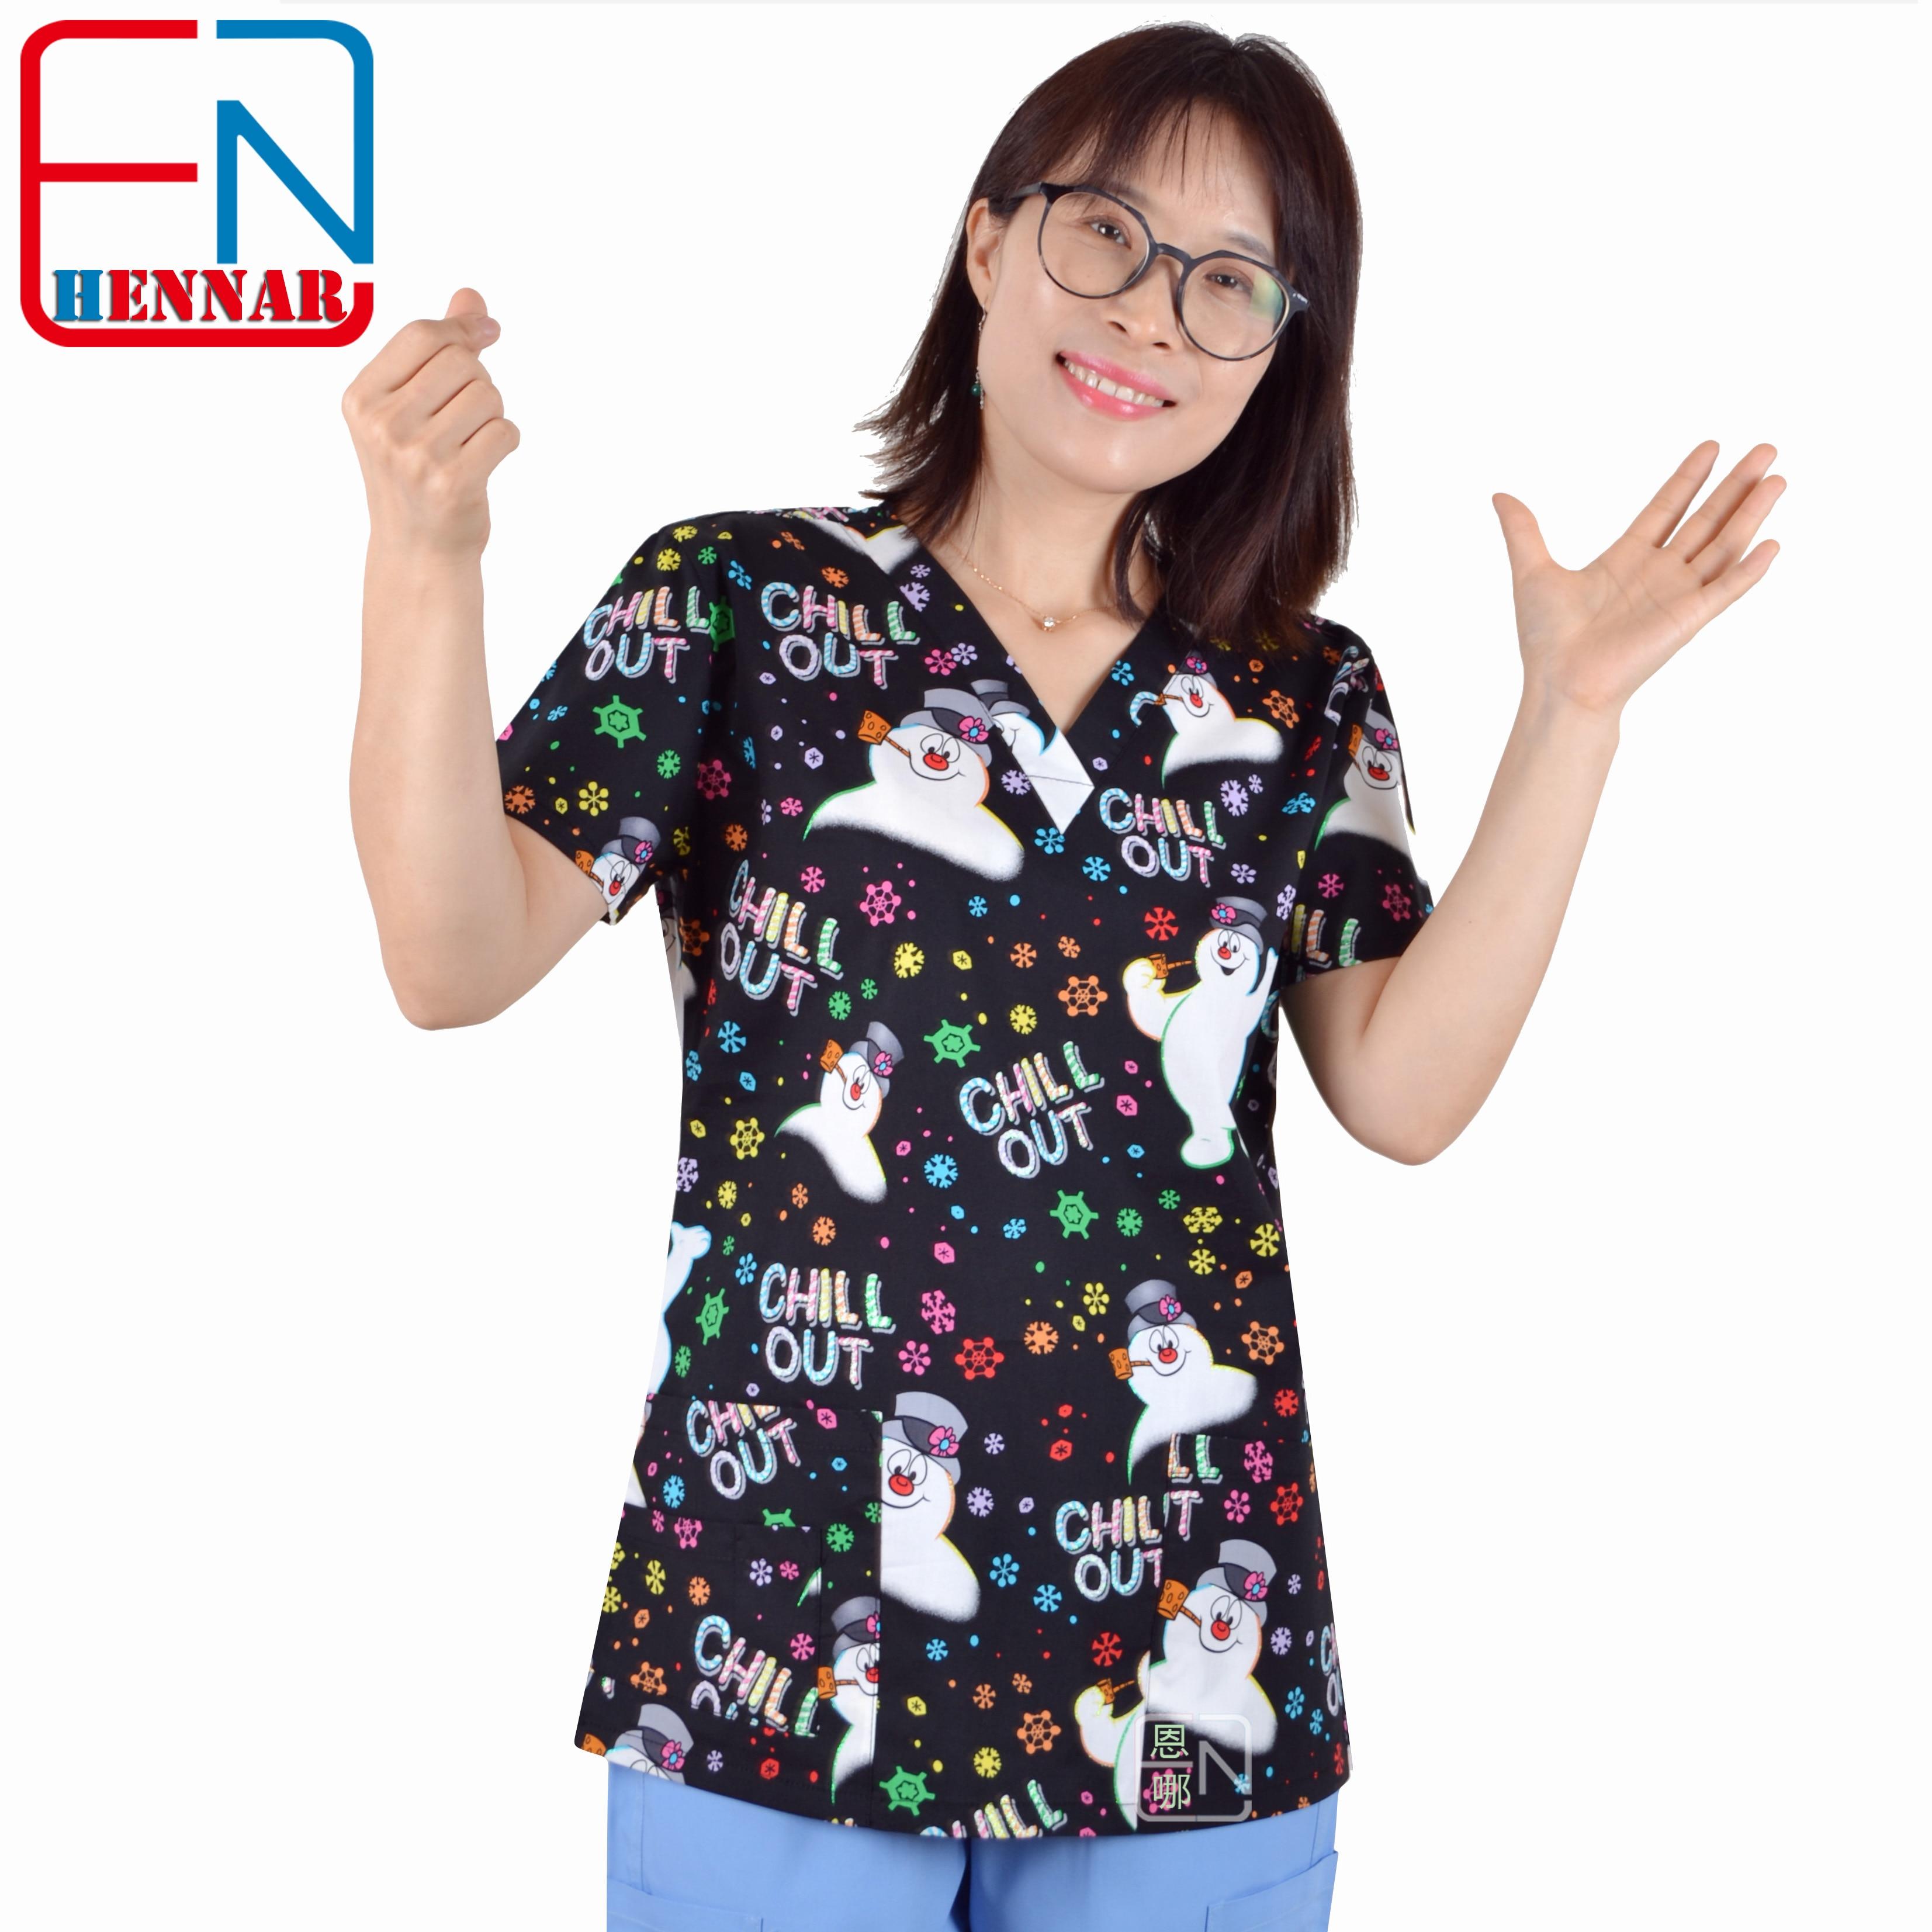 Brand Medical Scrub Tops For Women Surgical Scrubs,scrub Uniform In 100% Print Cotton Christmas Series